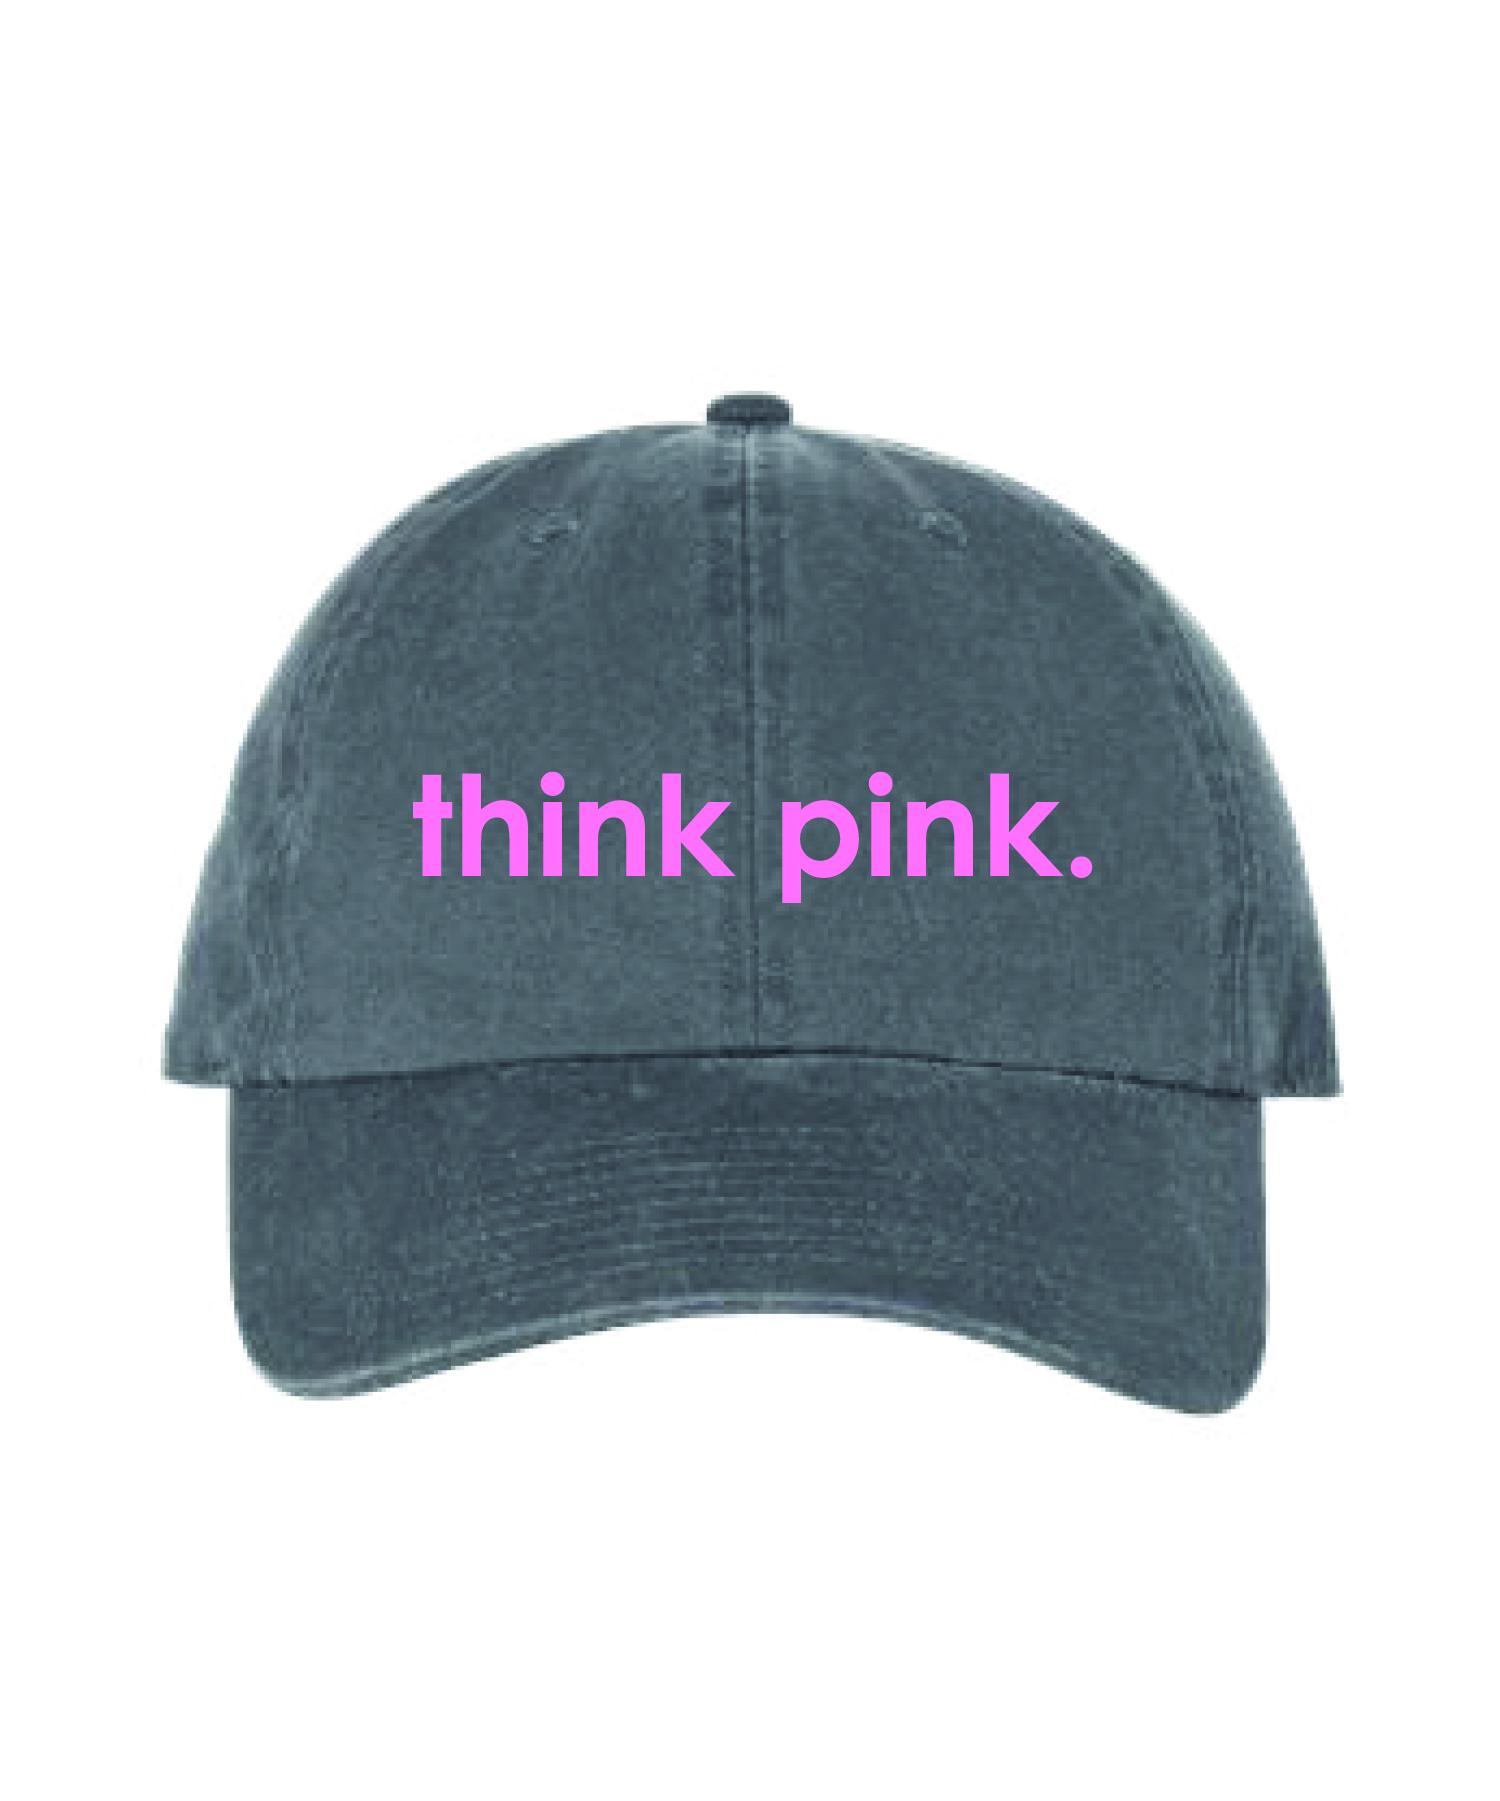 THINK PINK HAT